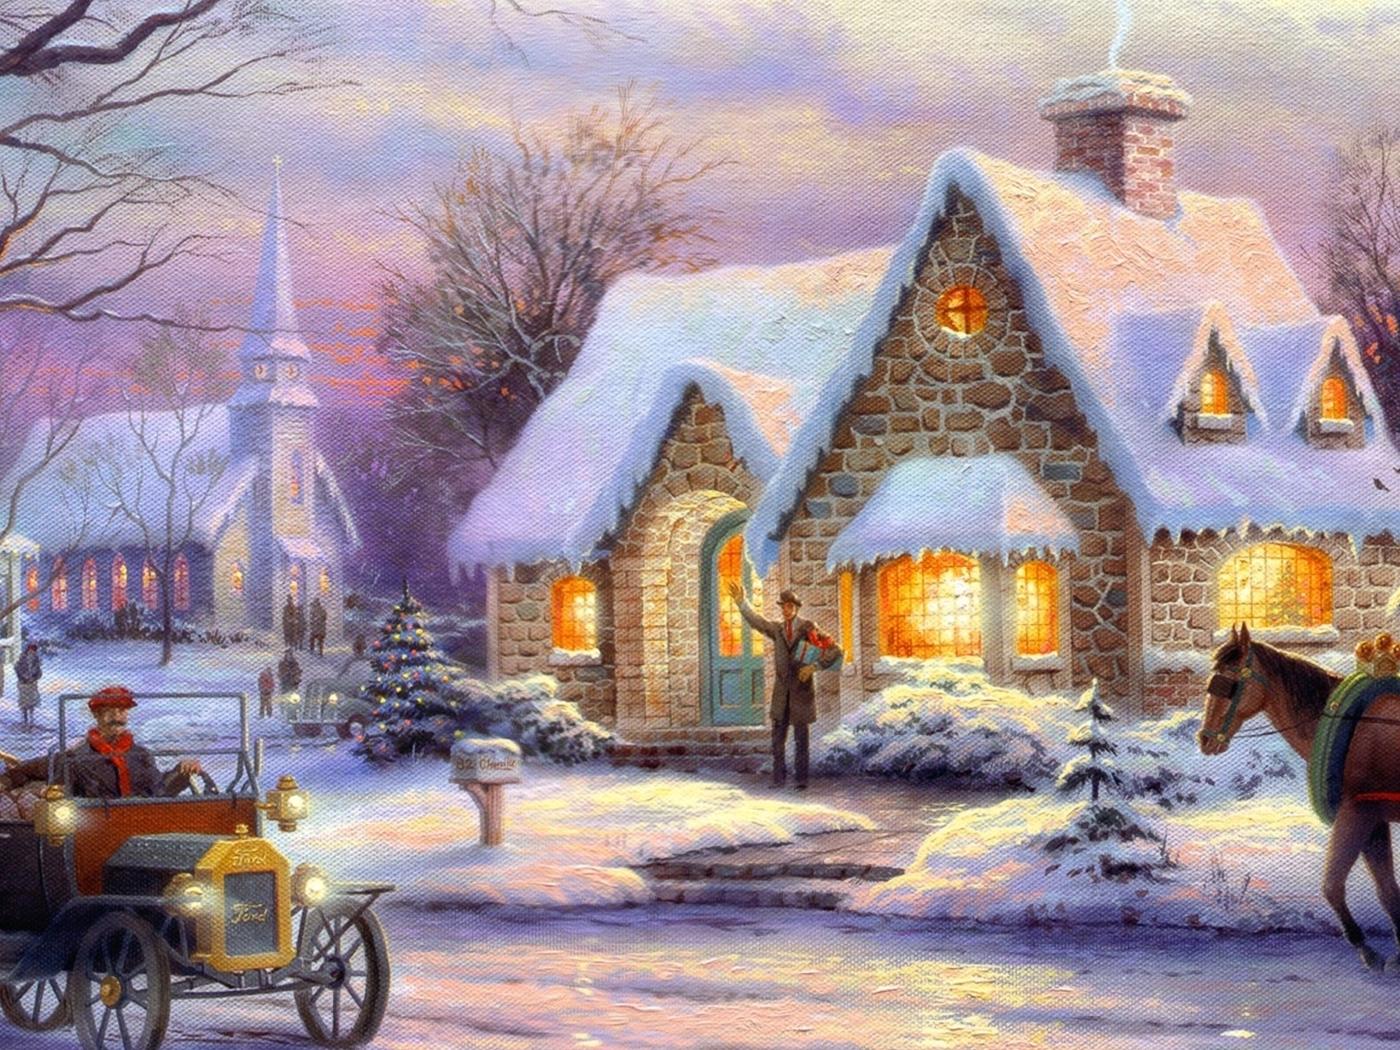 holiday-graphics-pic.jpg